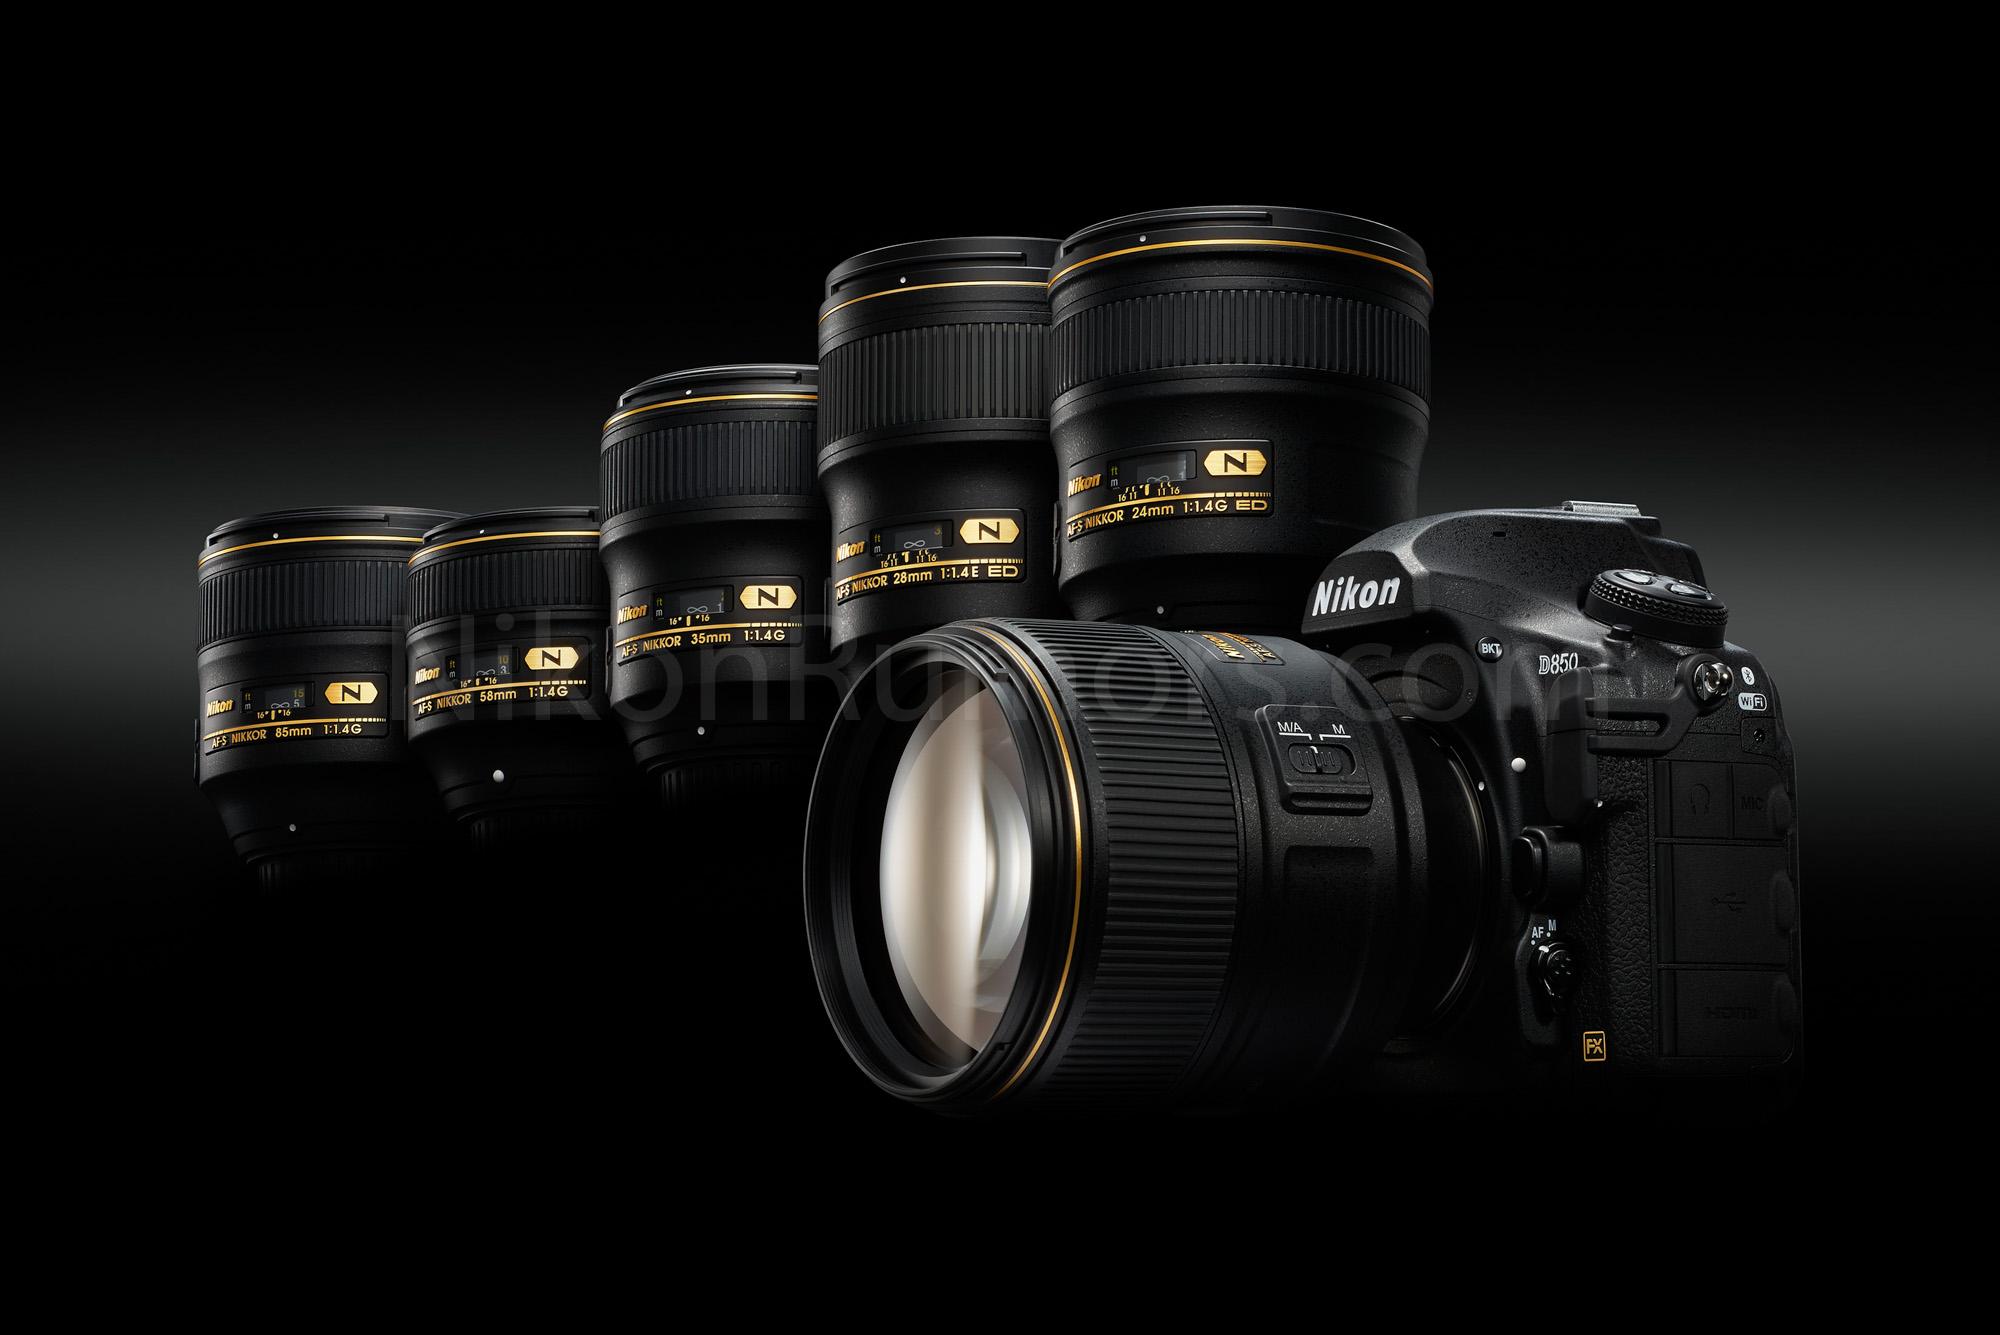 Nikon D850 Leaked Press Photos, Press Release, Sample Images